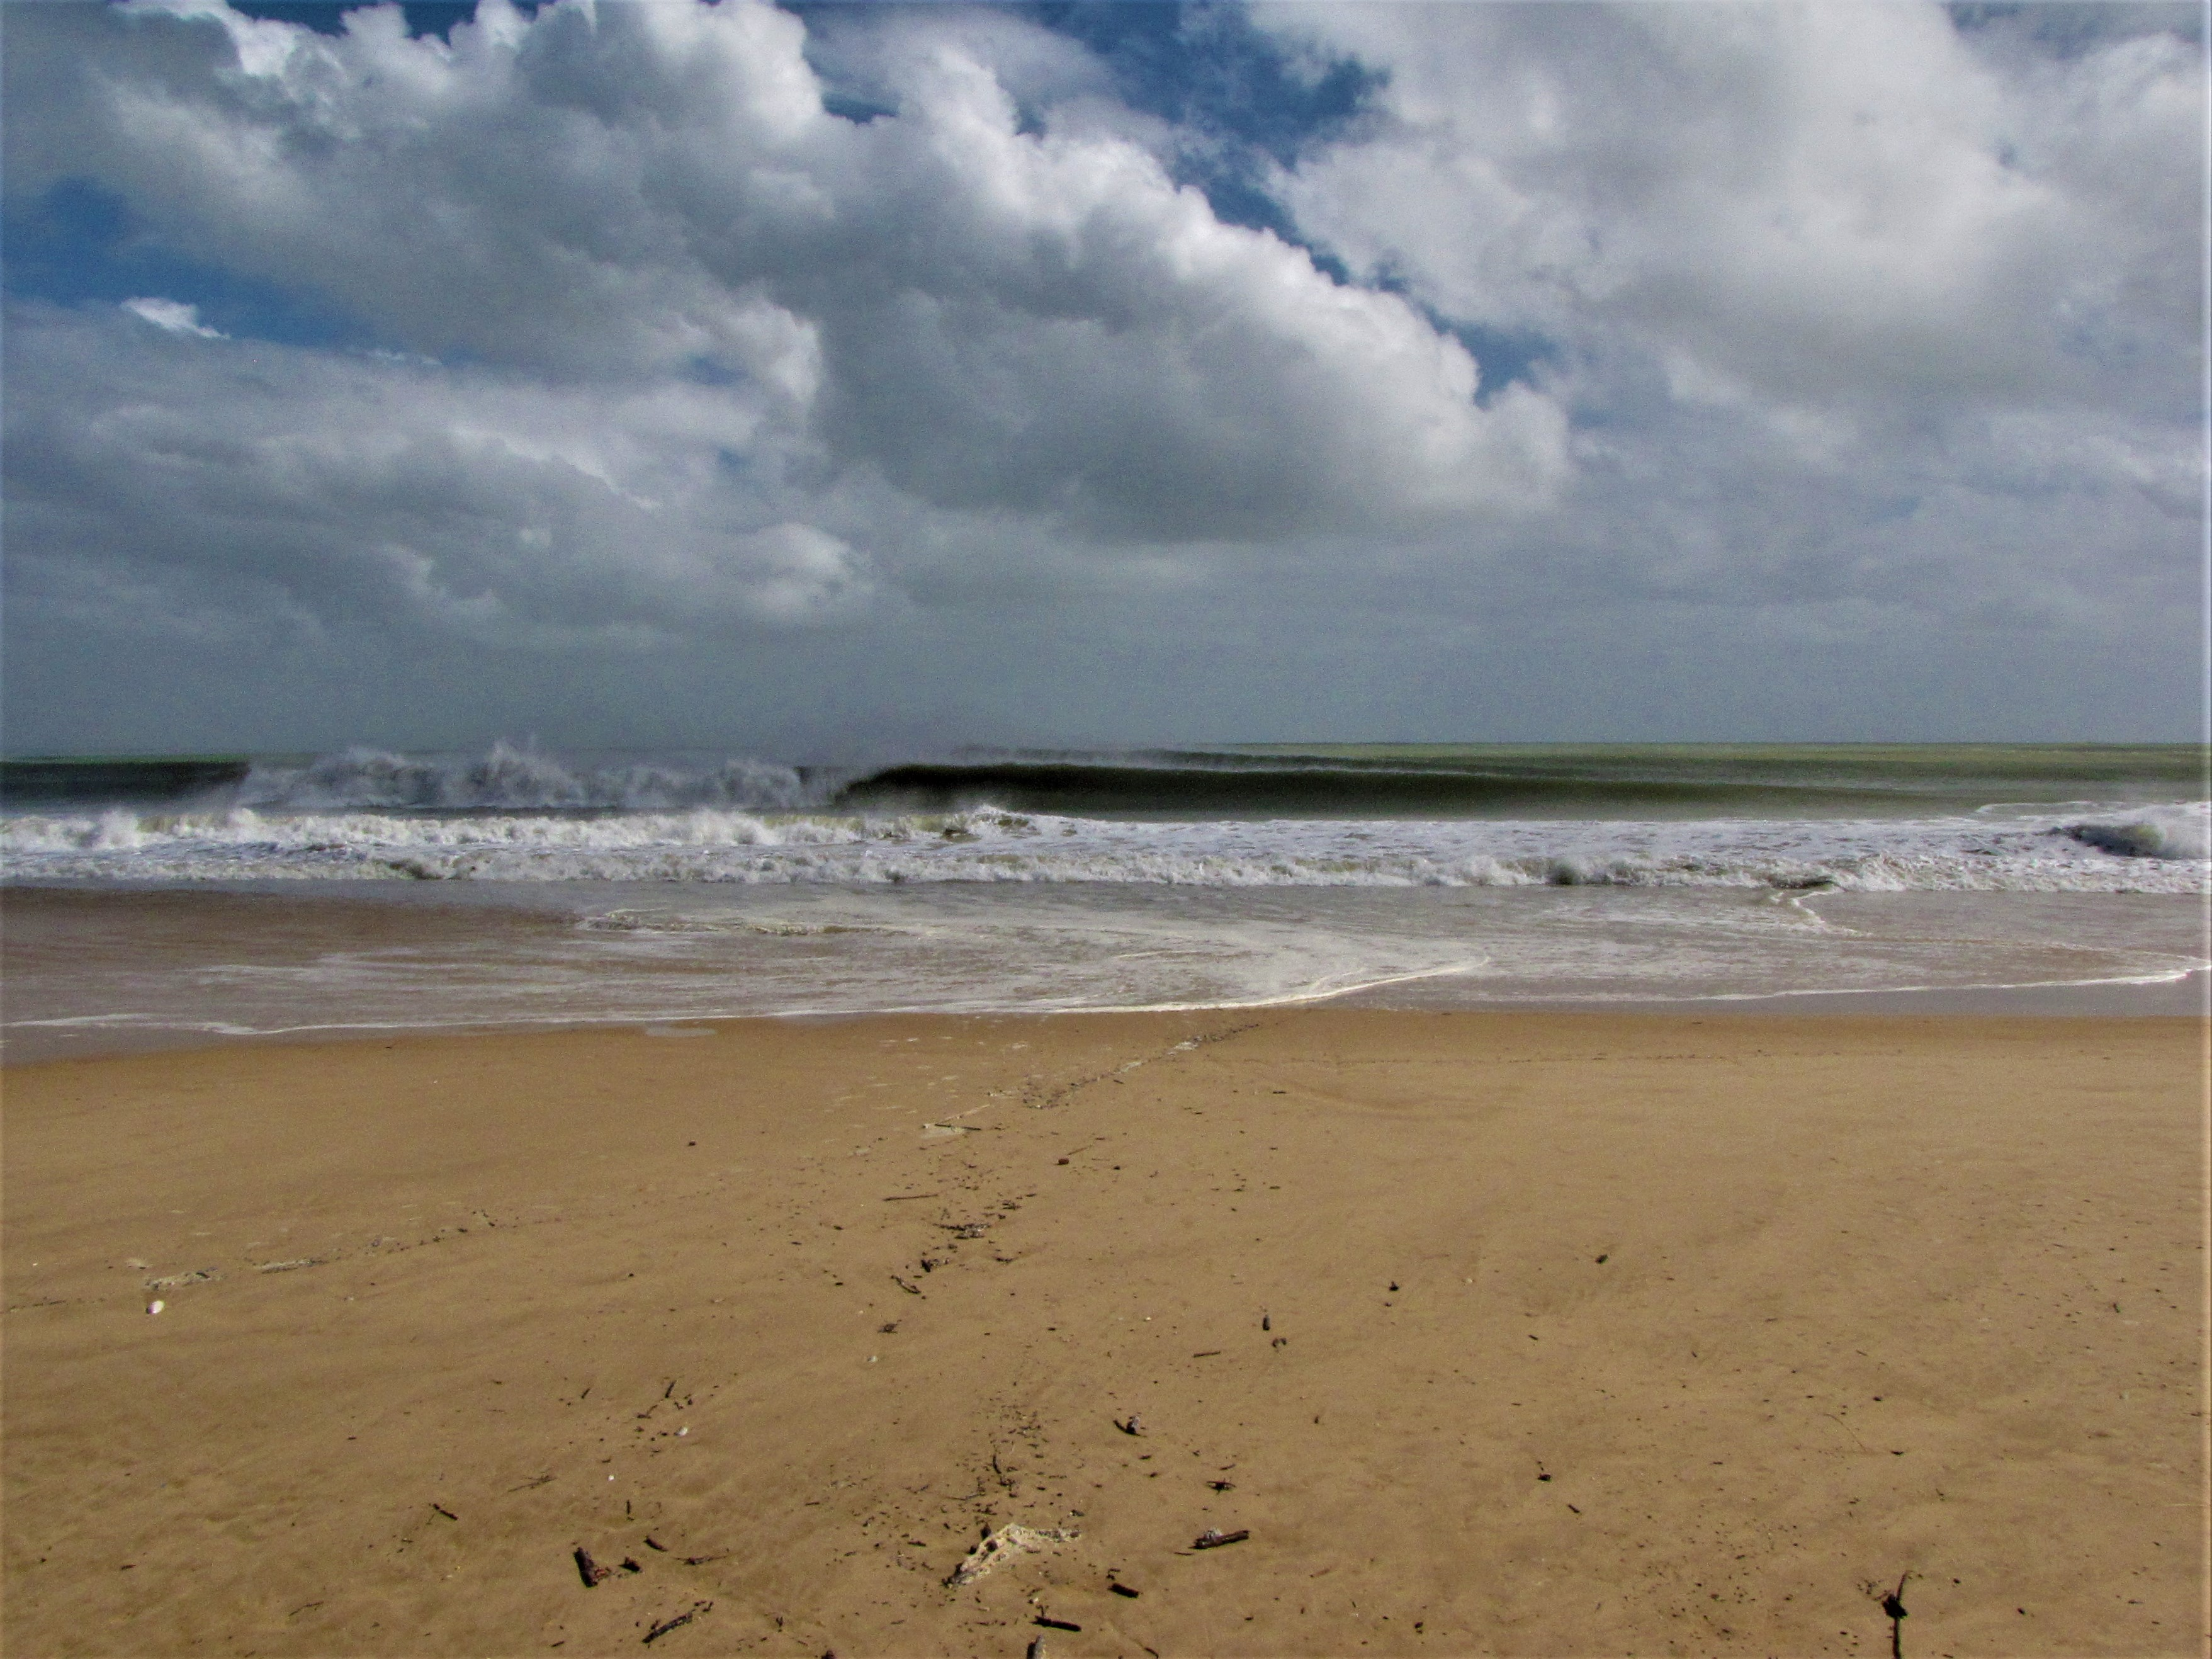 left hand barrel at meia praia